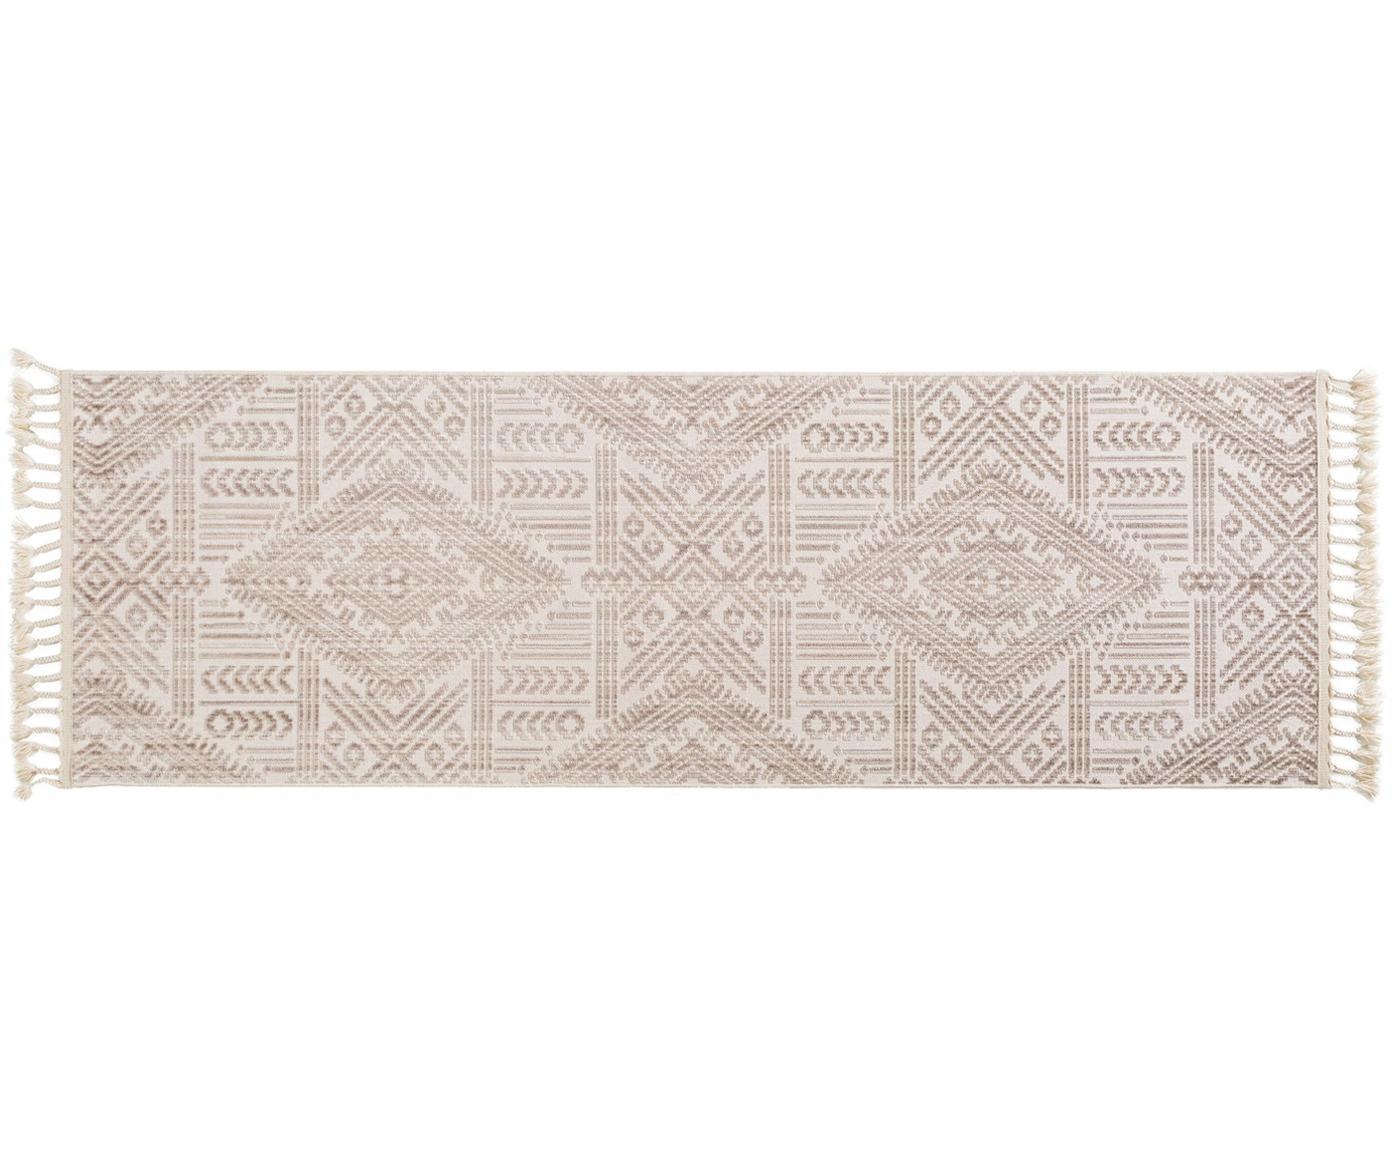 Passatoia con frange Laila Tang, Retro: cotone, Color crema, Larg. 80 x Lung. 240 cm